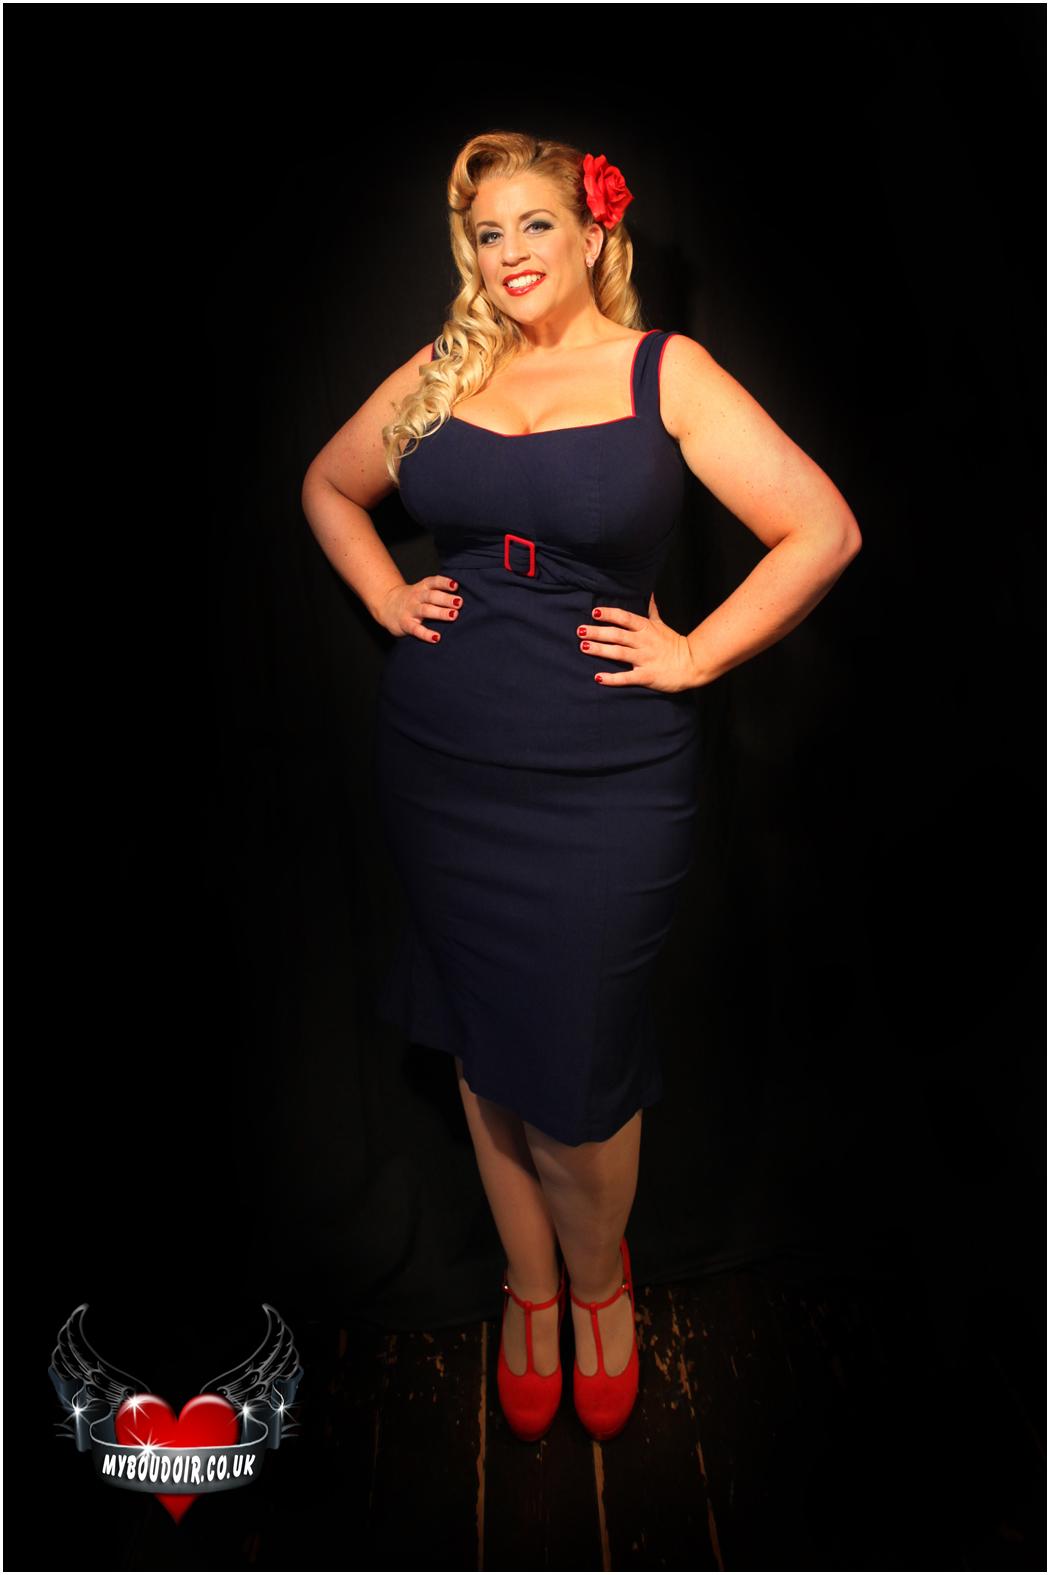 d879e24051645  My Boudoir   My Very First Photoshoot Experience - Curvy Wordy